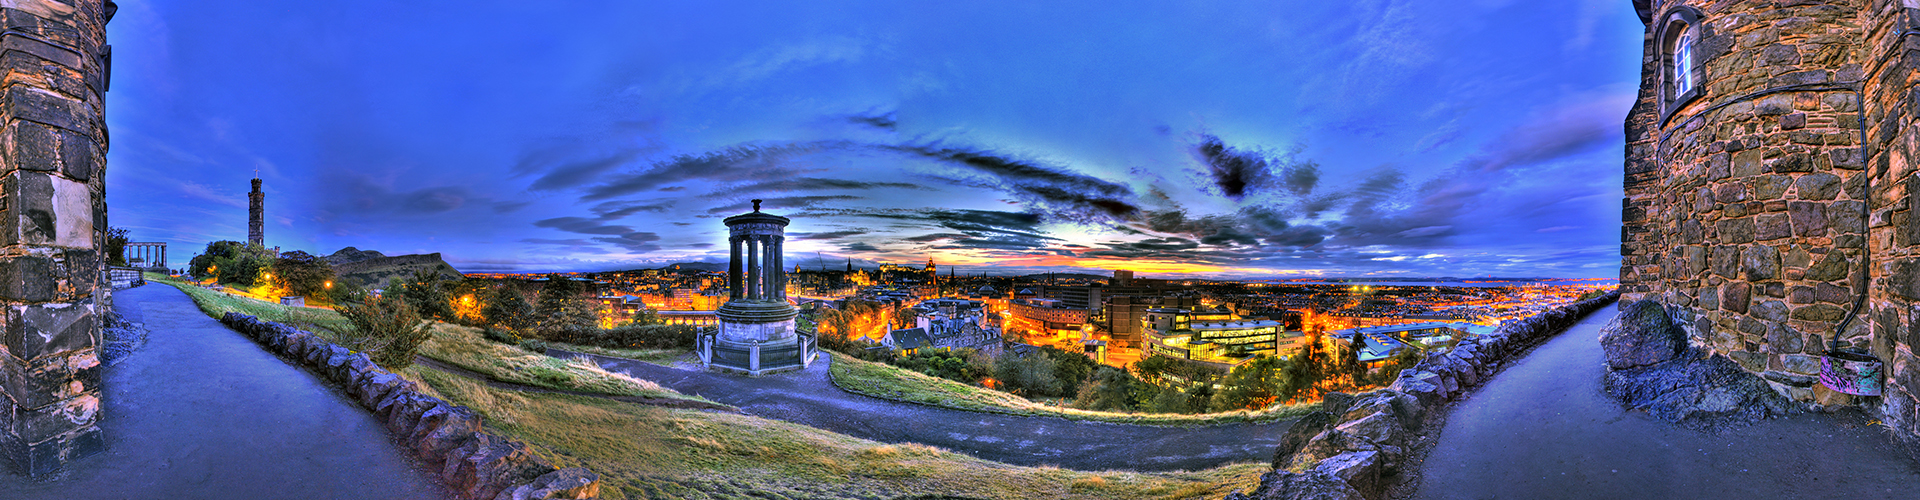 Edinburgh City  360º Panorama by Matt Wright